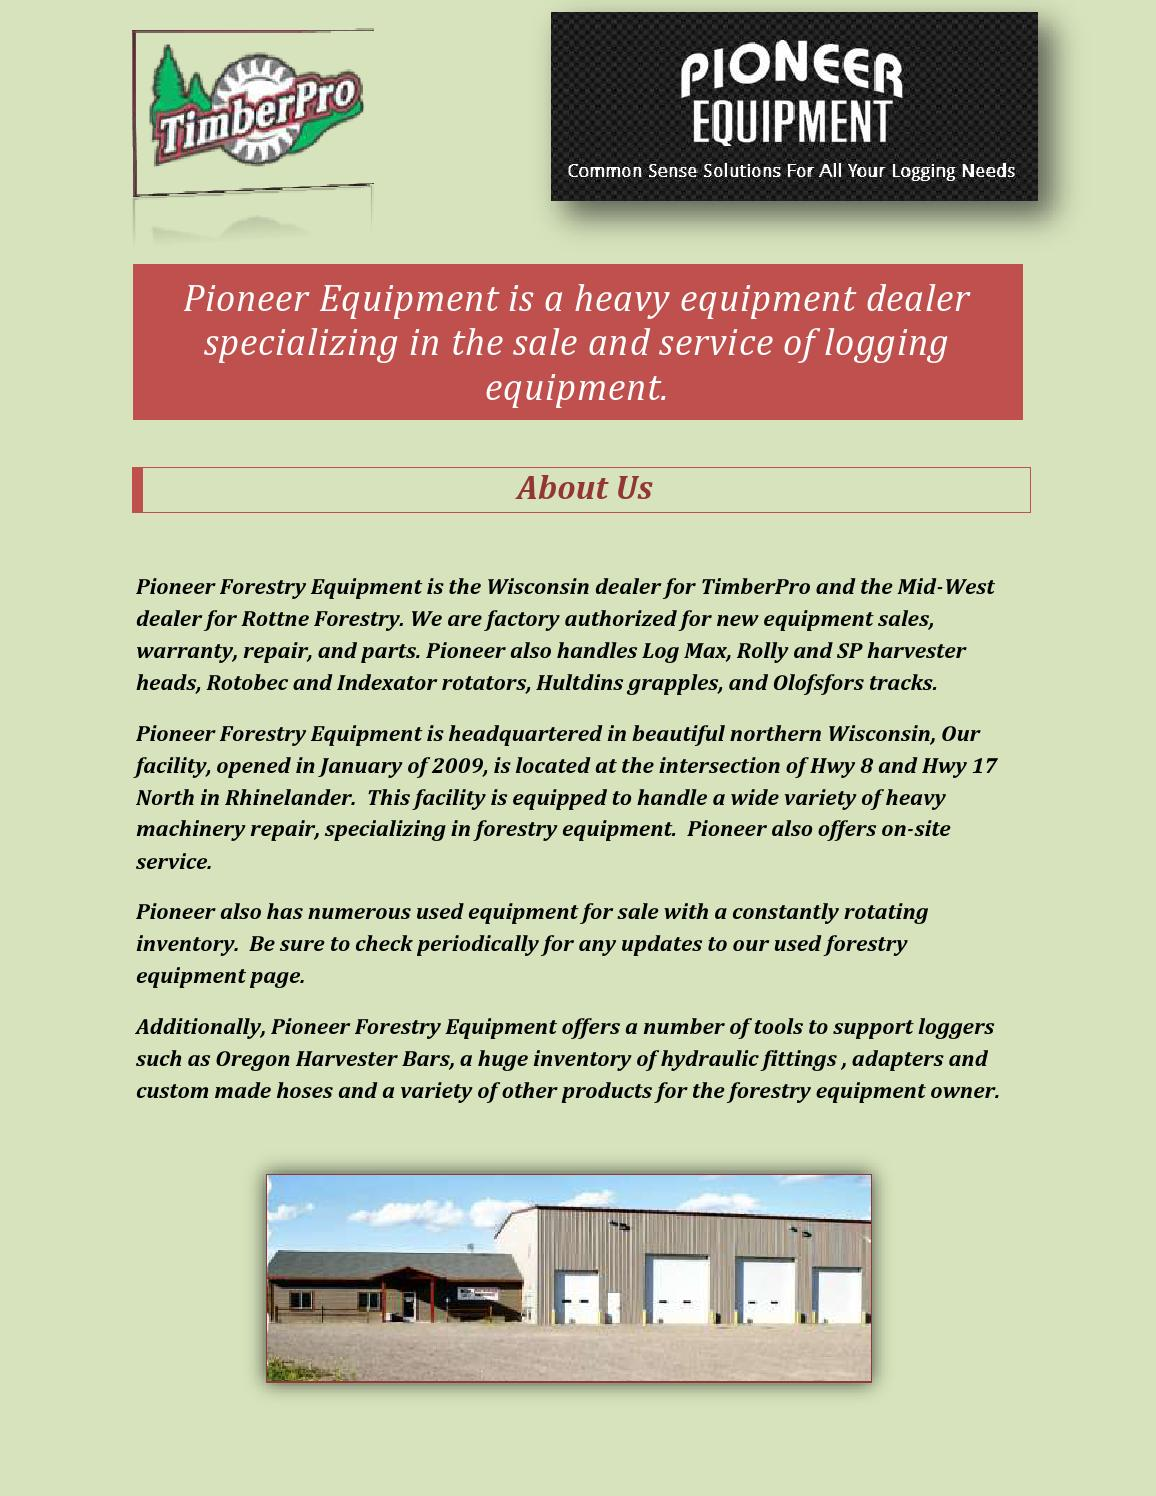 Logging forestry equipment by pioneerforestryequipment - issuu